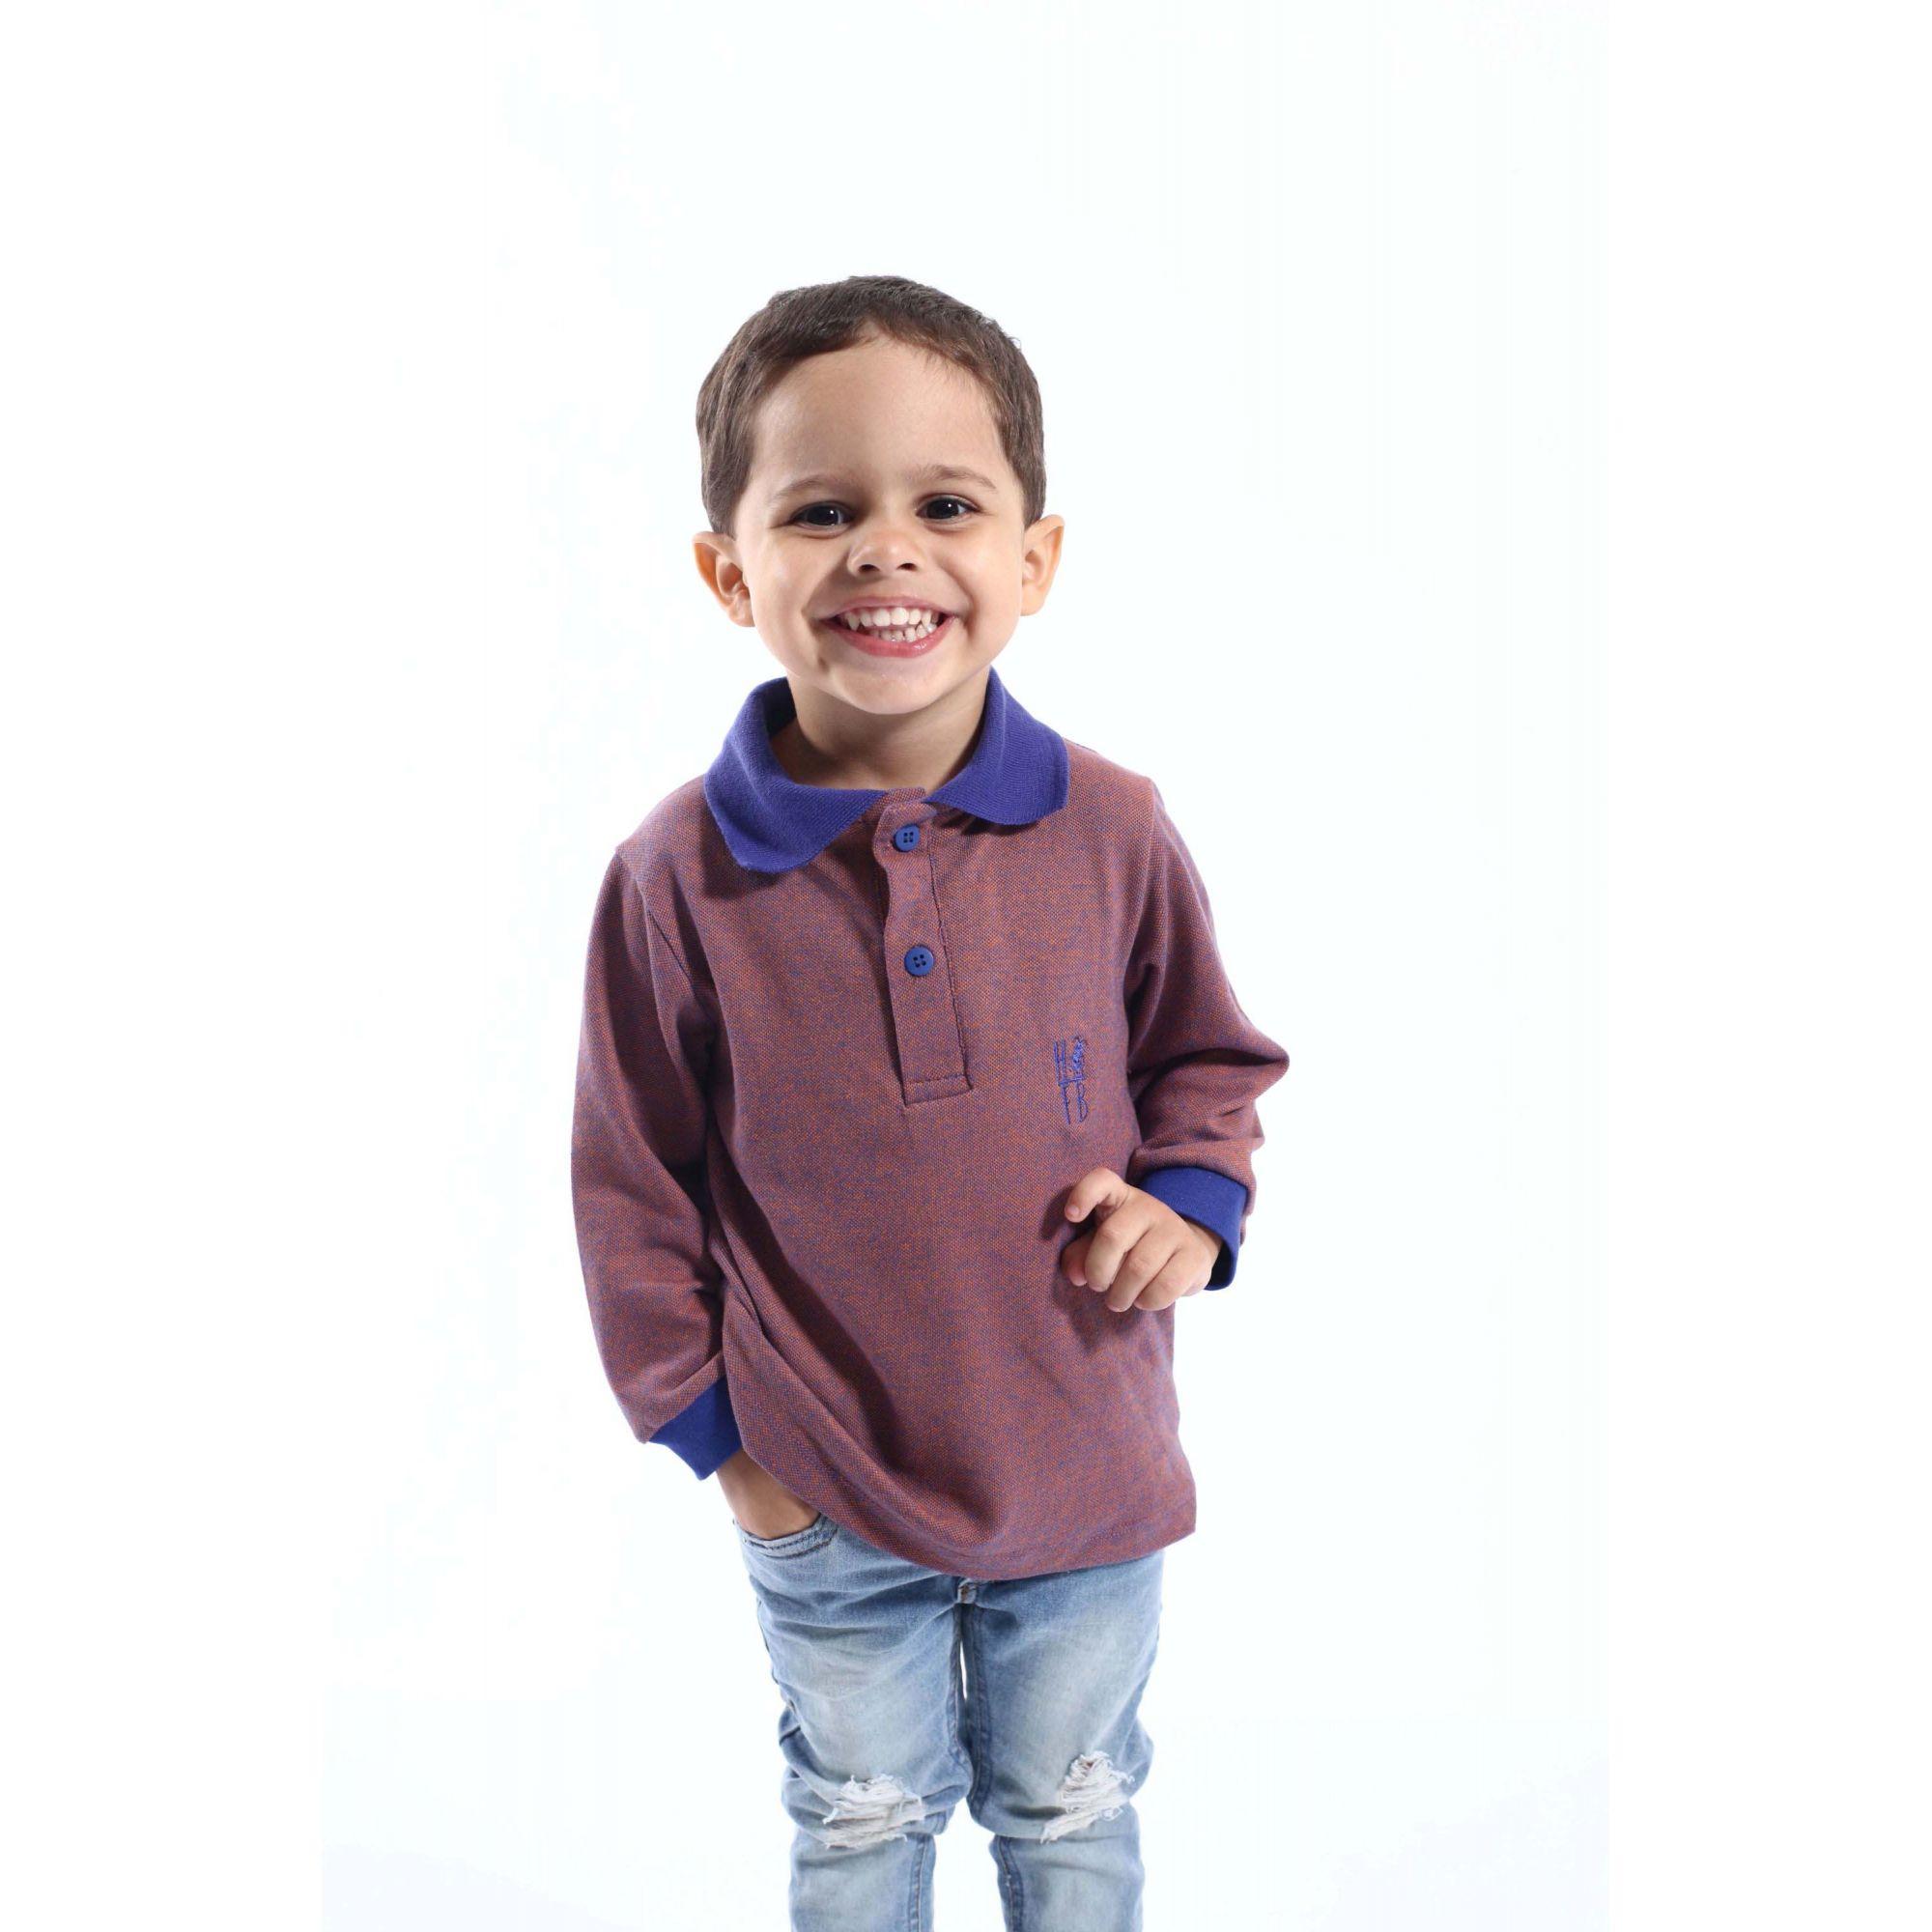 Camisa Polo Infantil Laranja Manga Longa  - Heitor Fashion Brazil